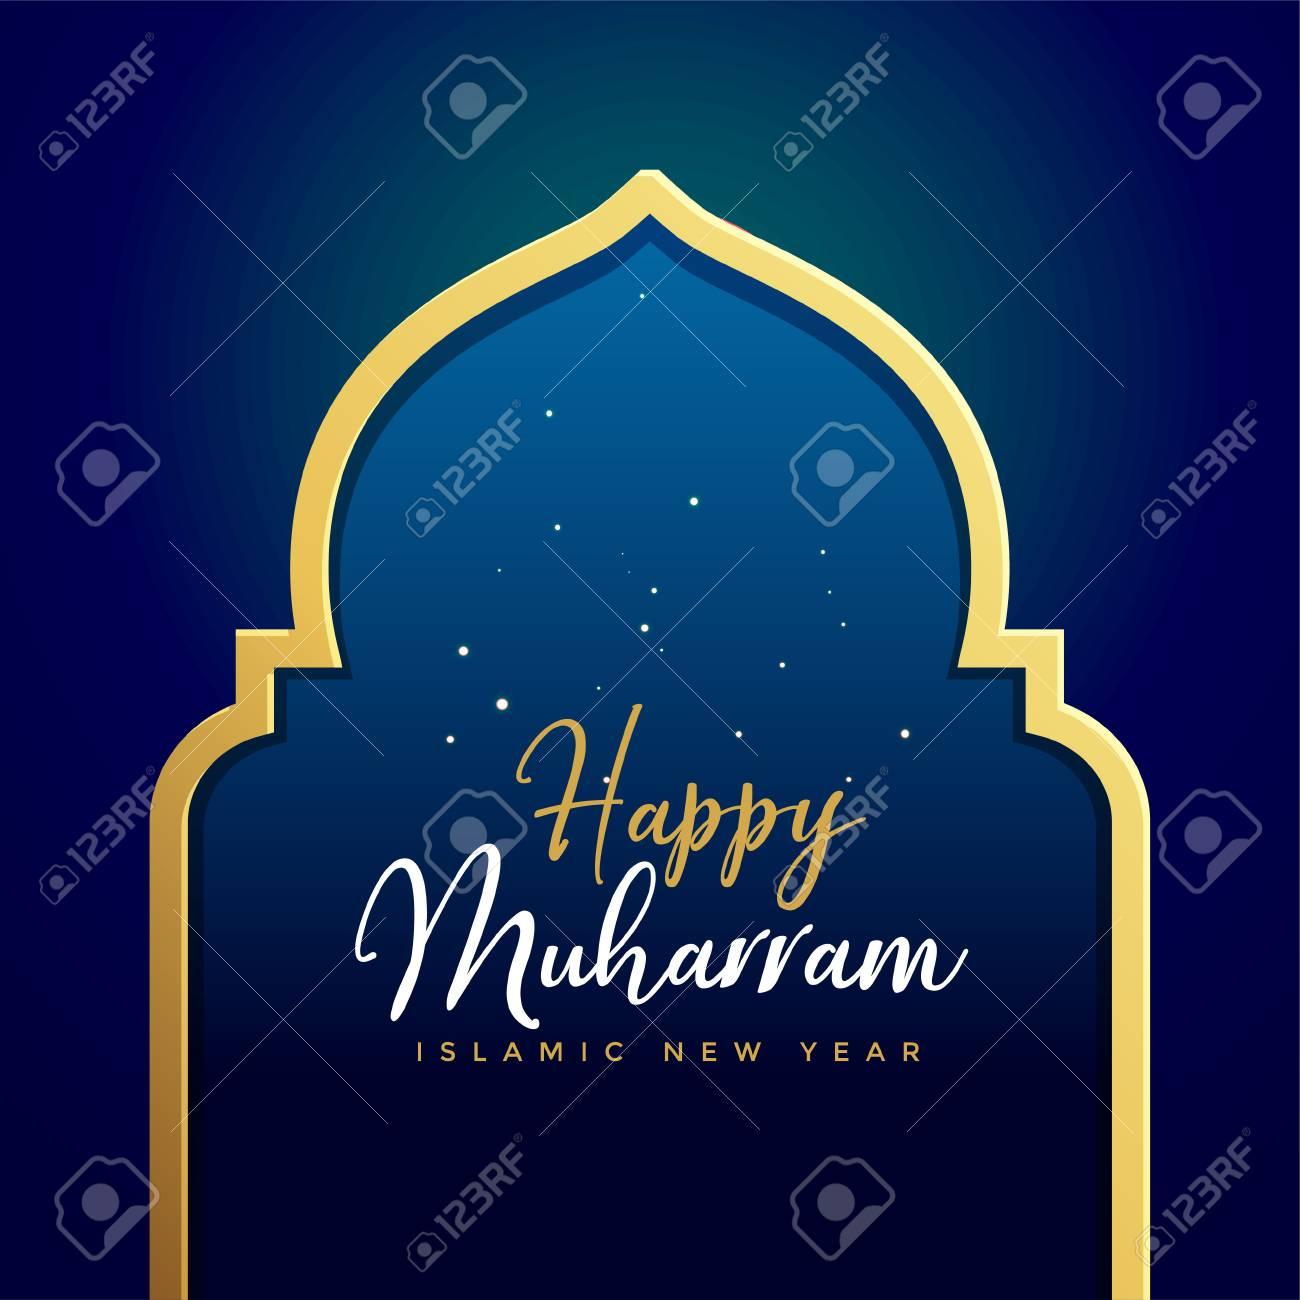 happy muharram islamic background with golden gate - 106317634